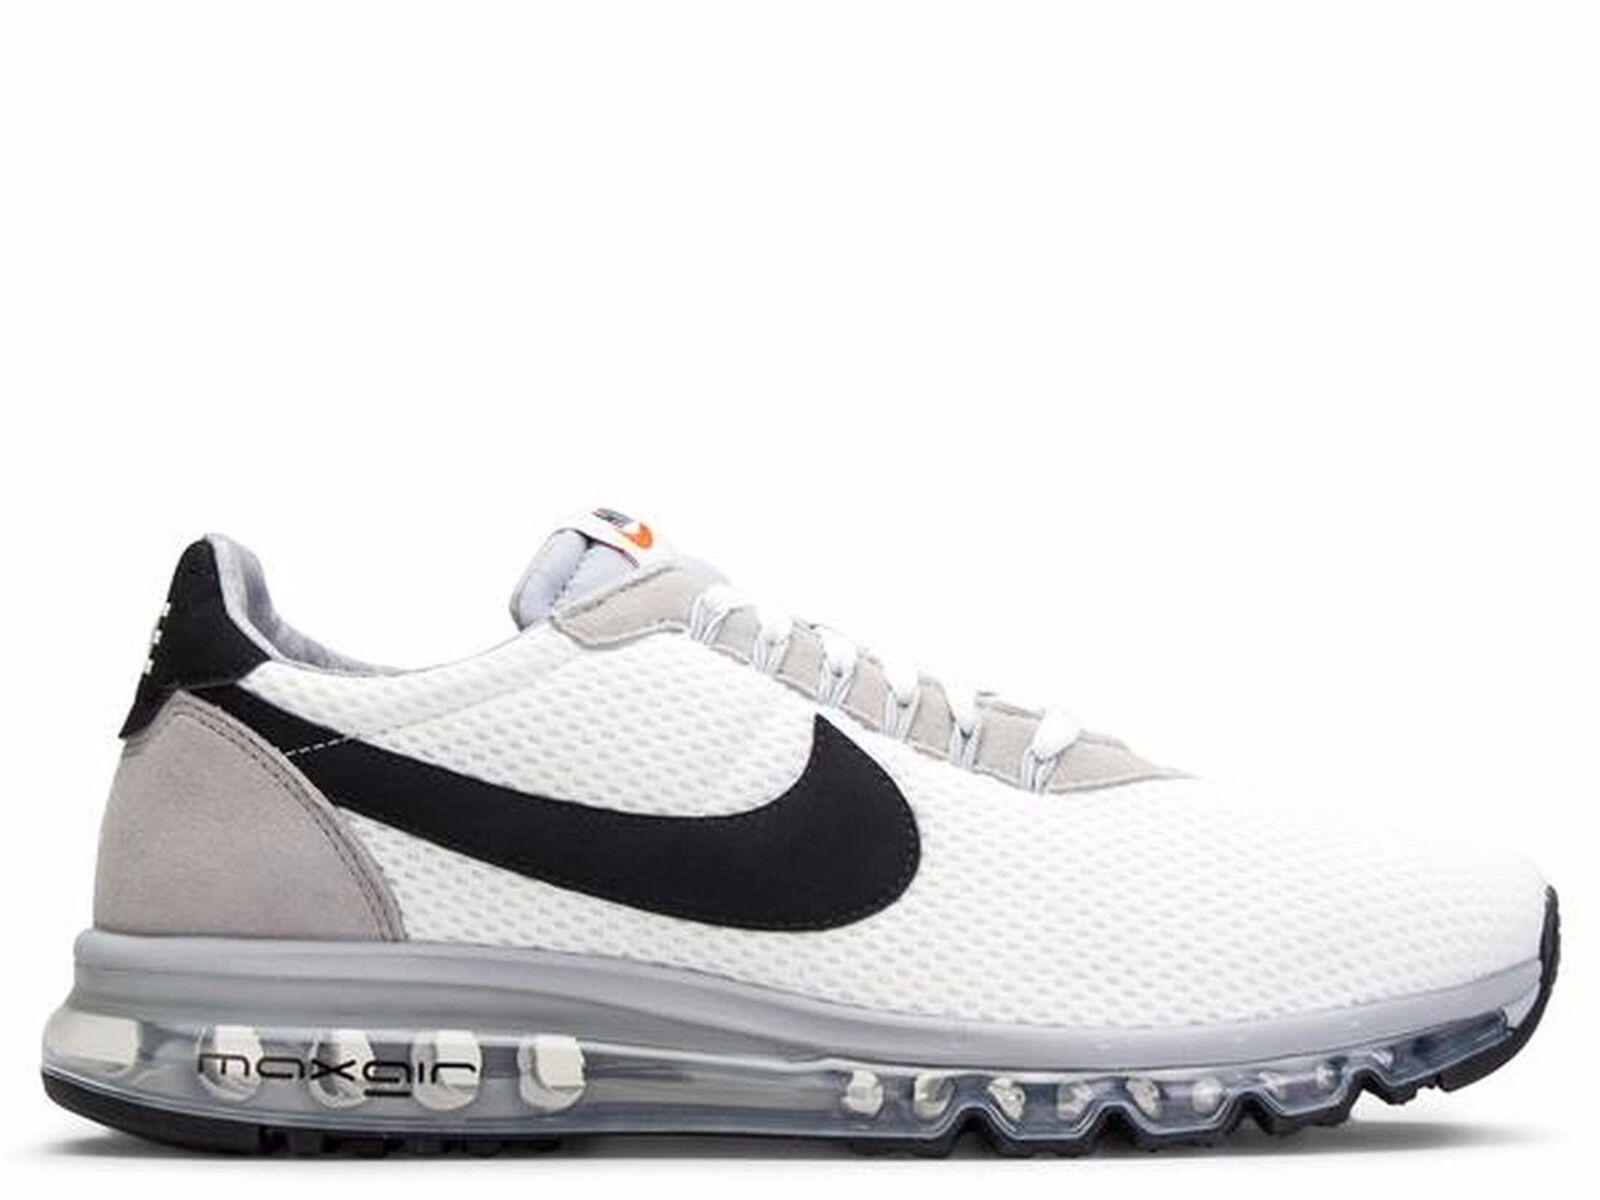 Nike Air Max LD-Zero Summit White Black Wolf Gray 848624-101 Mens Sz 11.5 Brand discount